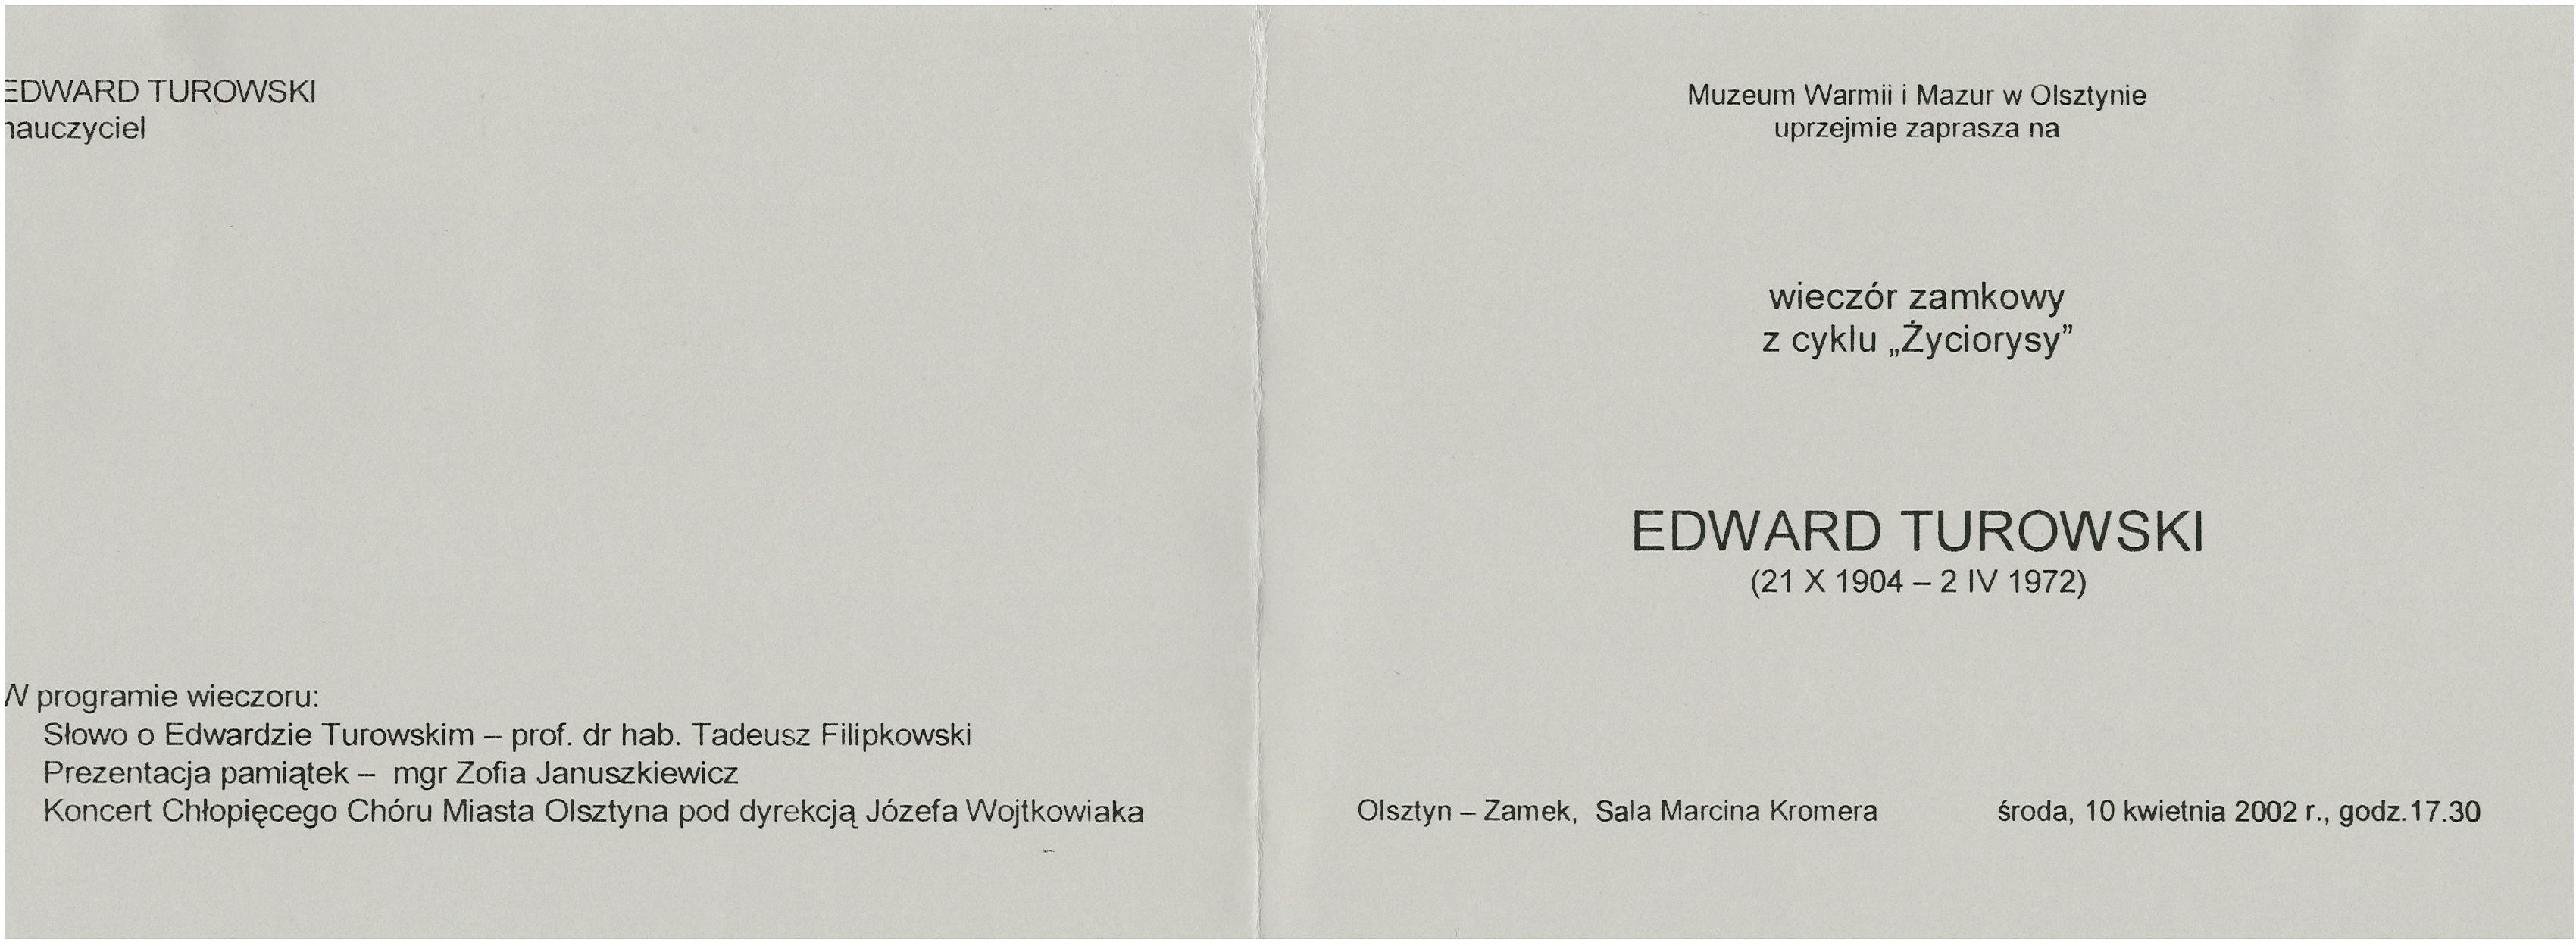 https://m.wmwm.pl/2015/04/orig/z-10-iv-02-turowski-2-4130.png